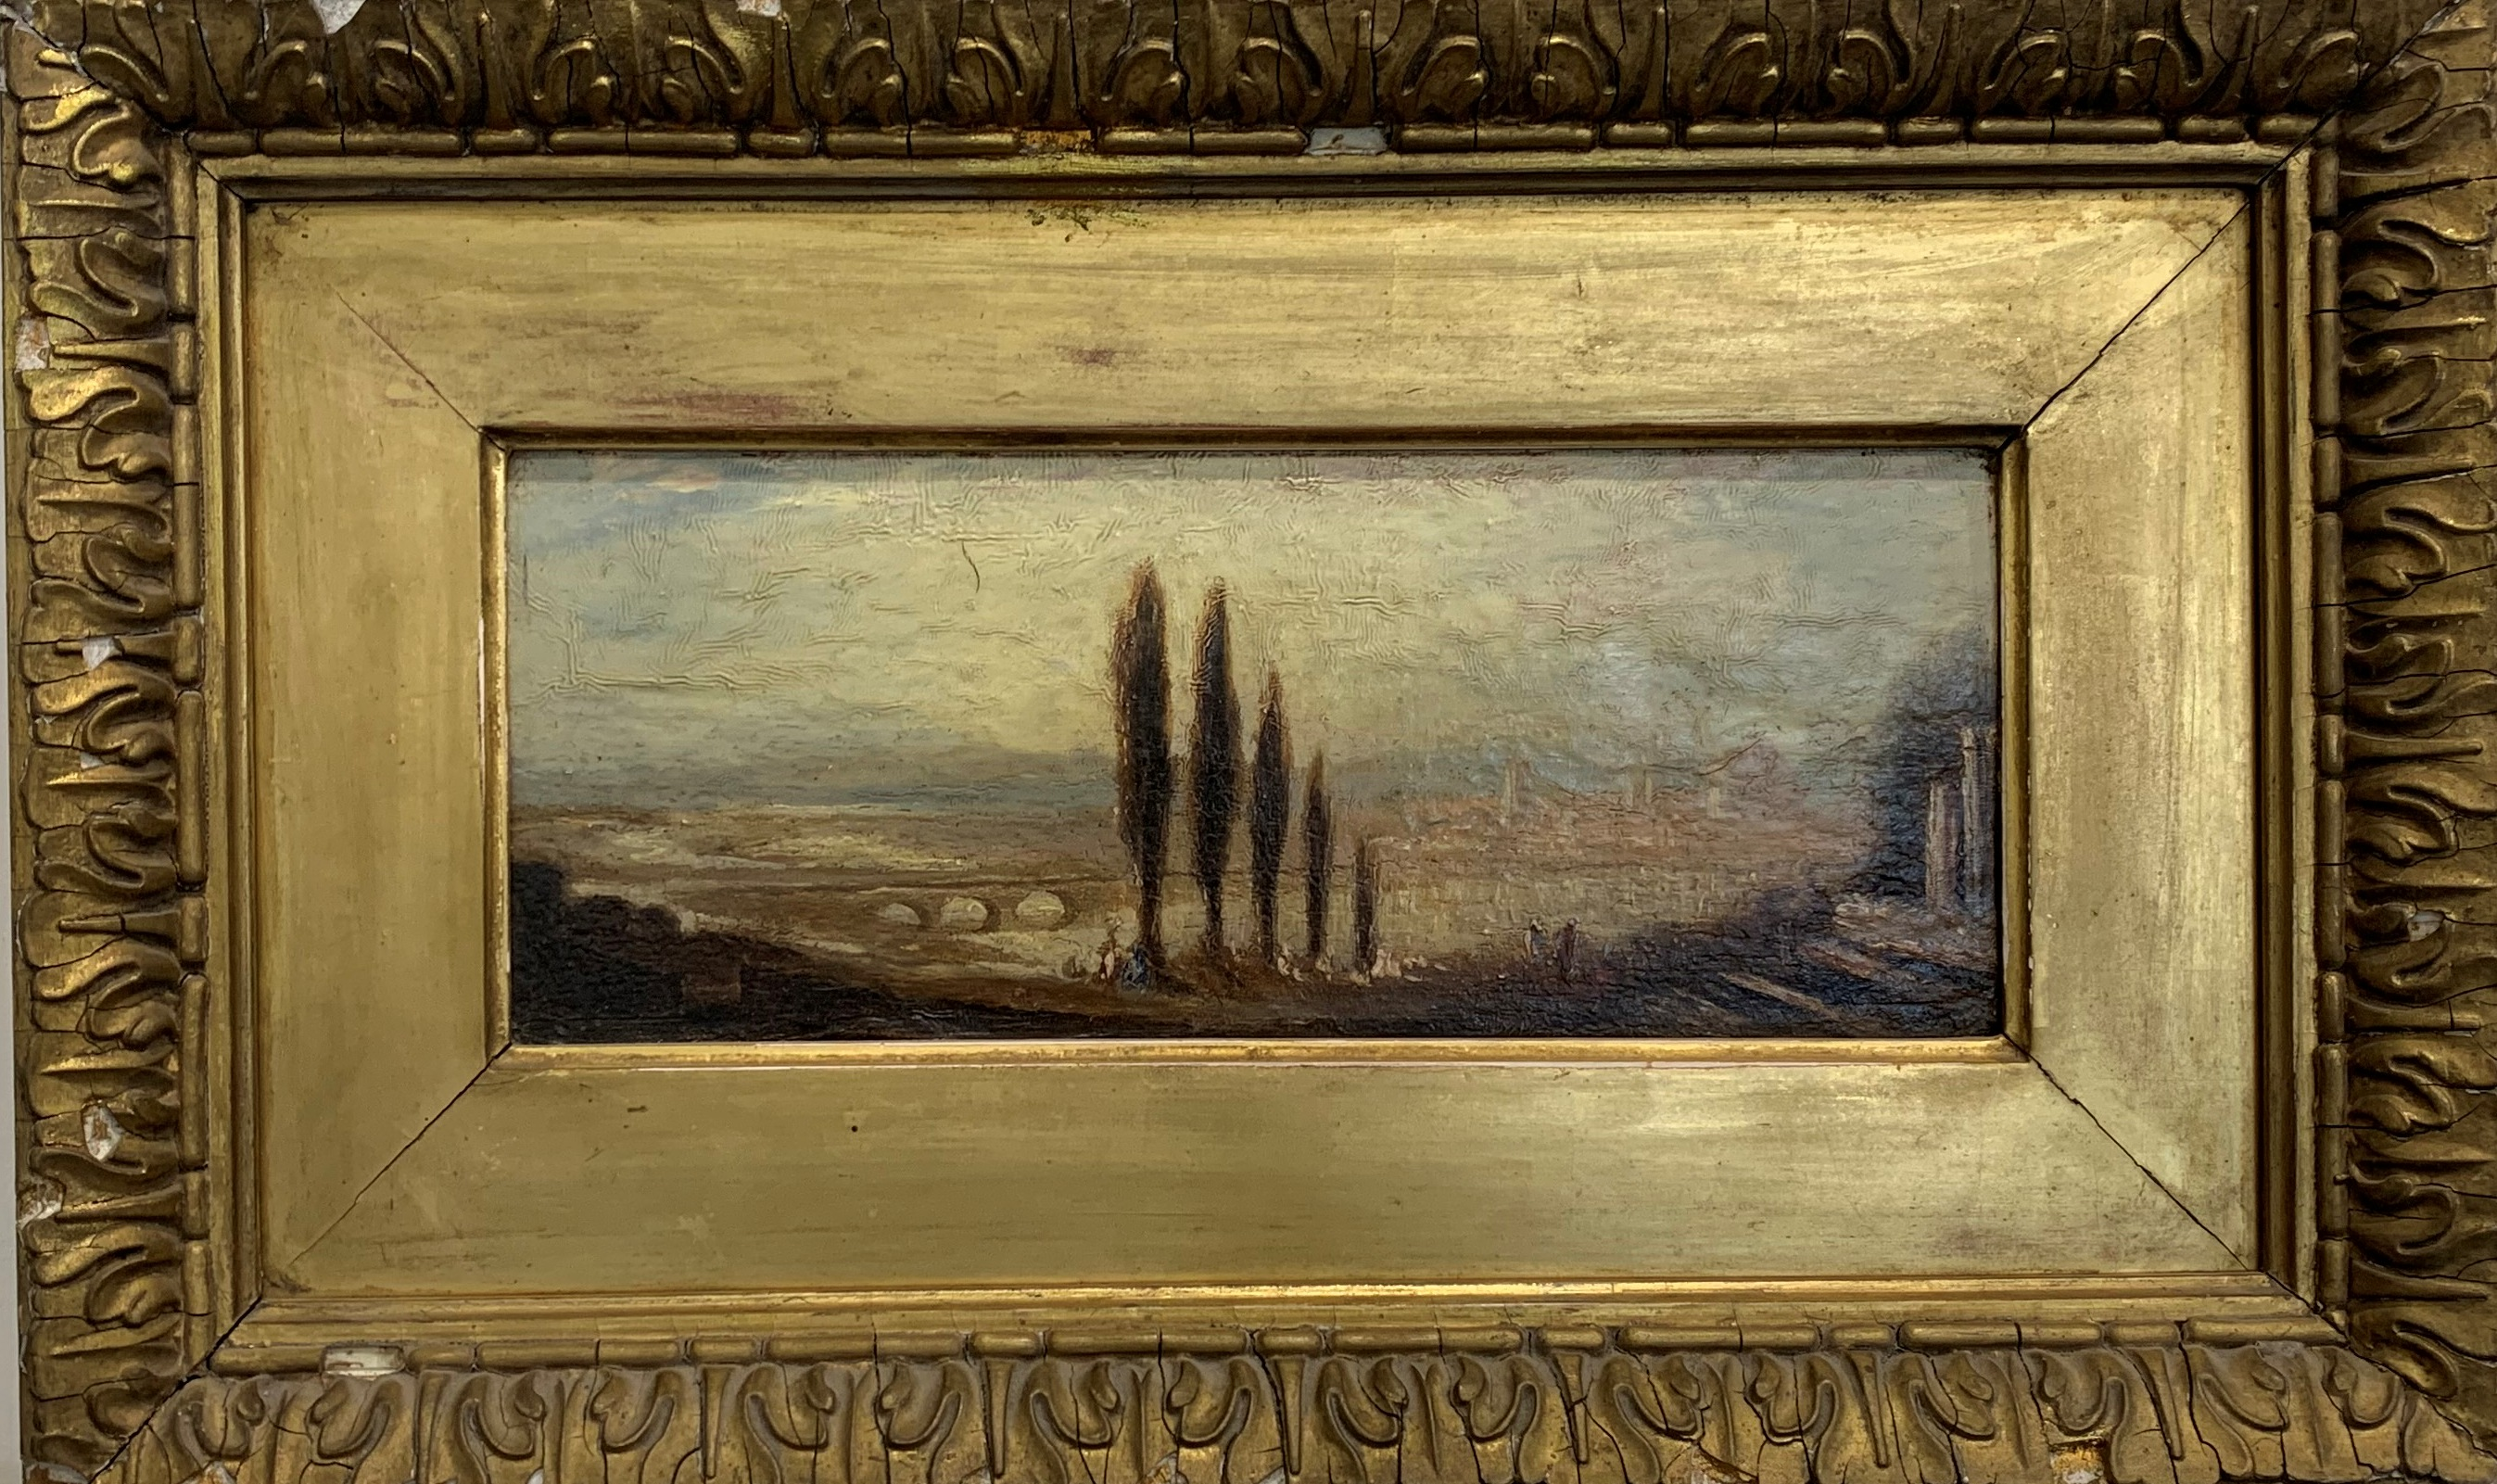 Italian School (19th century): Italianate Landscape, oil on panel unsigned 12cm x 30cm - Image 2 of 2